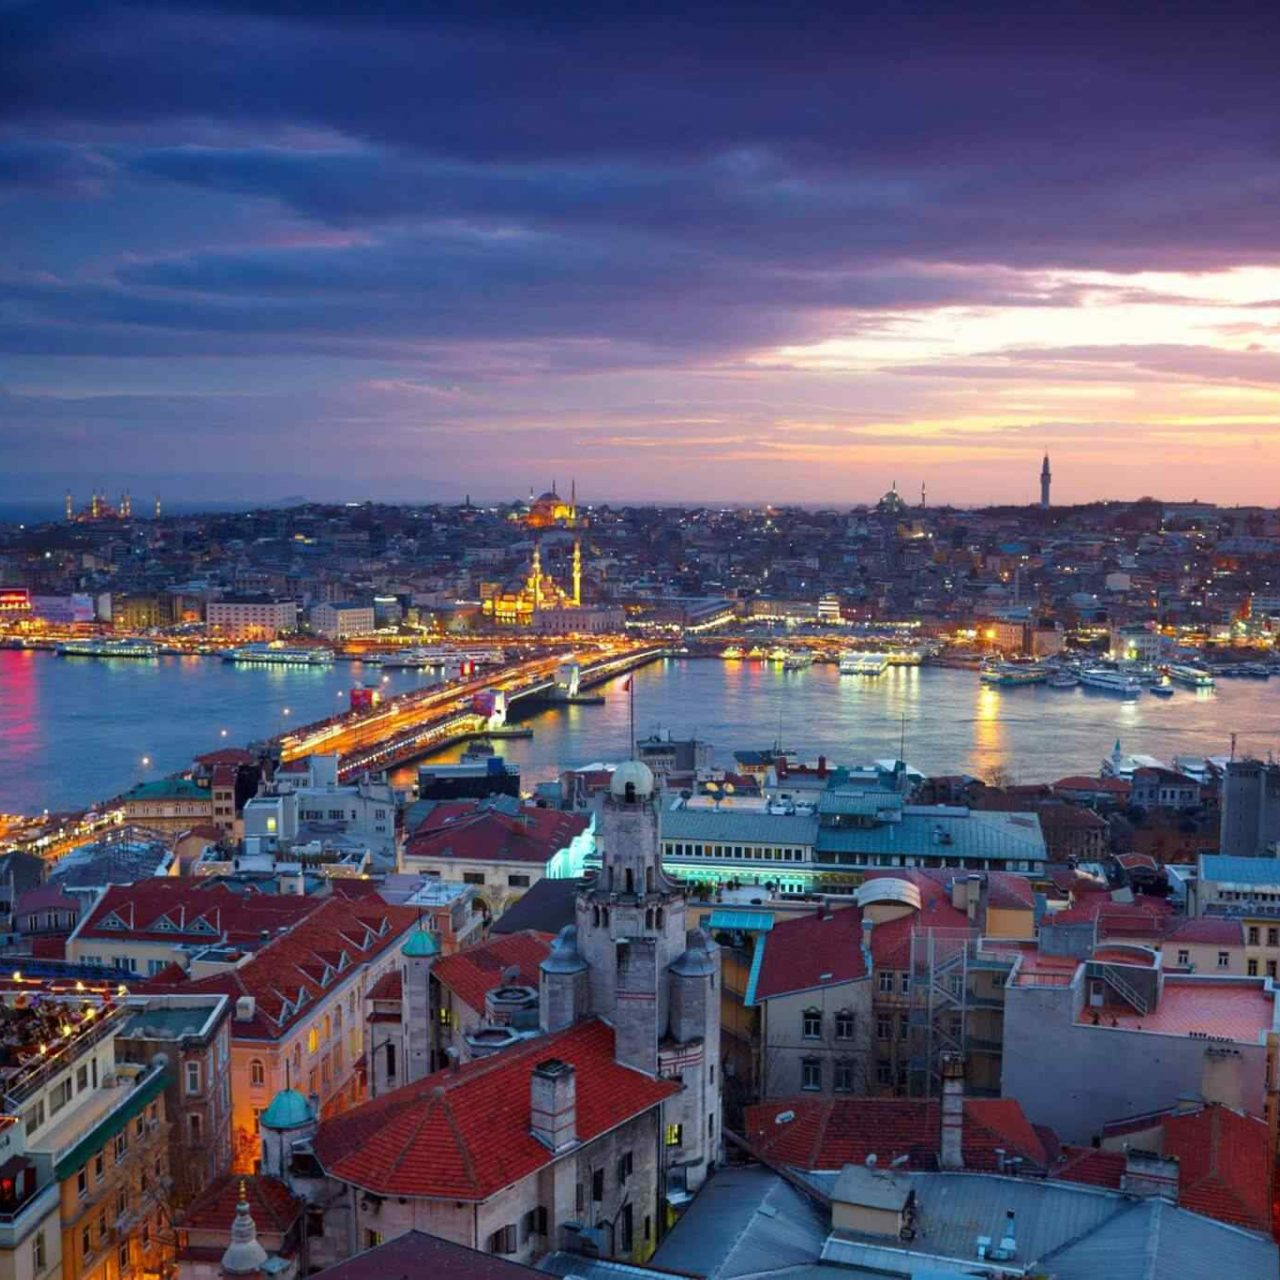 https://viveunbuenviaje.com/wp-content/uploads/2018/09/destination-istanbul-01-1280x1280.jpg